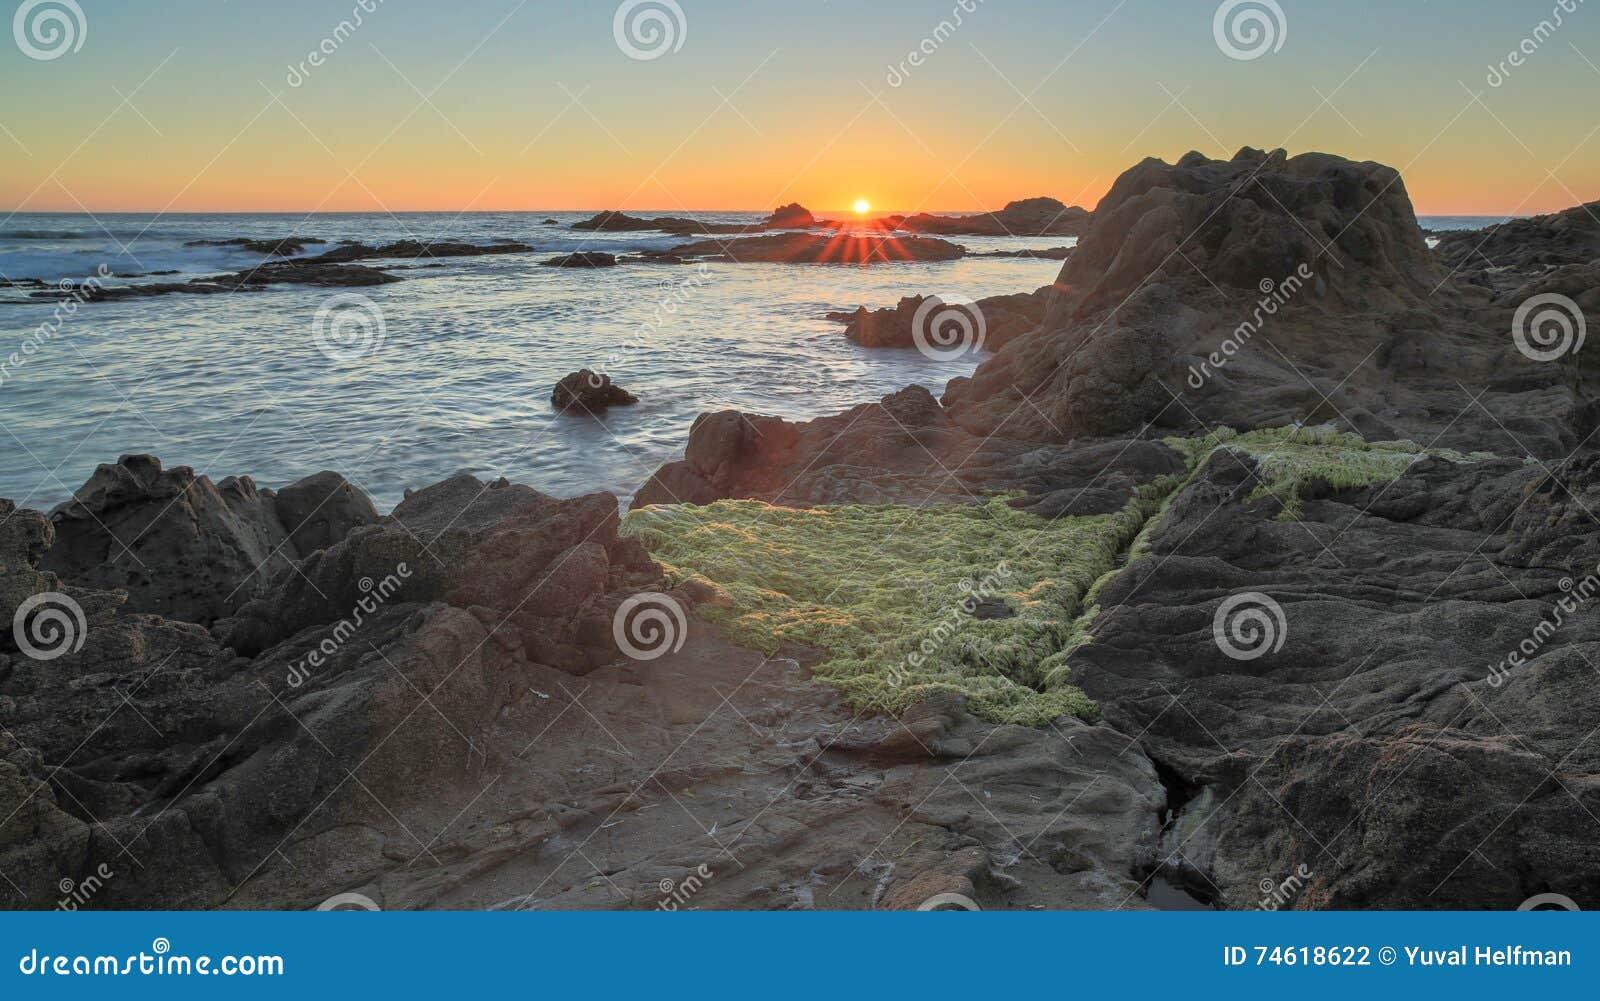 California san mateo county pescadero - Sunset Over Bean Hollow State Beach Pescadero California Usa Stock Photo